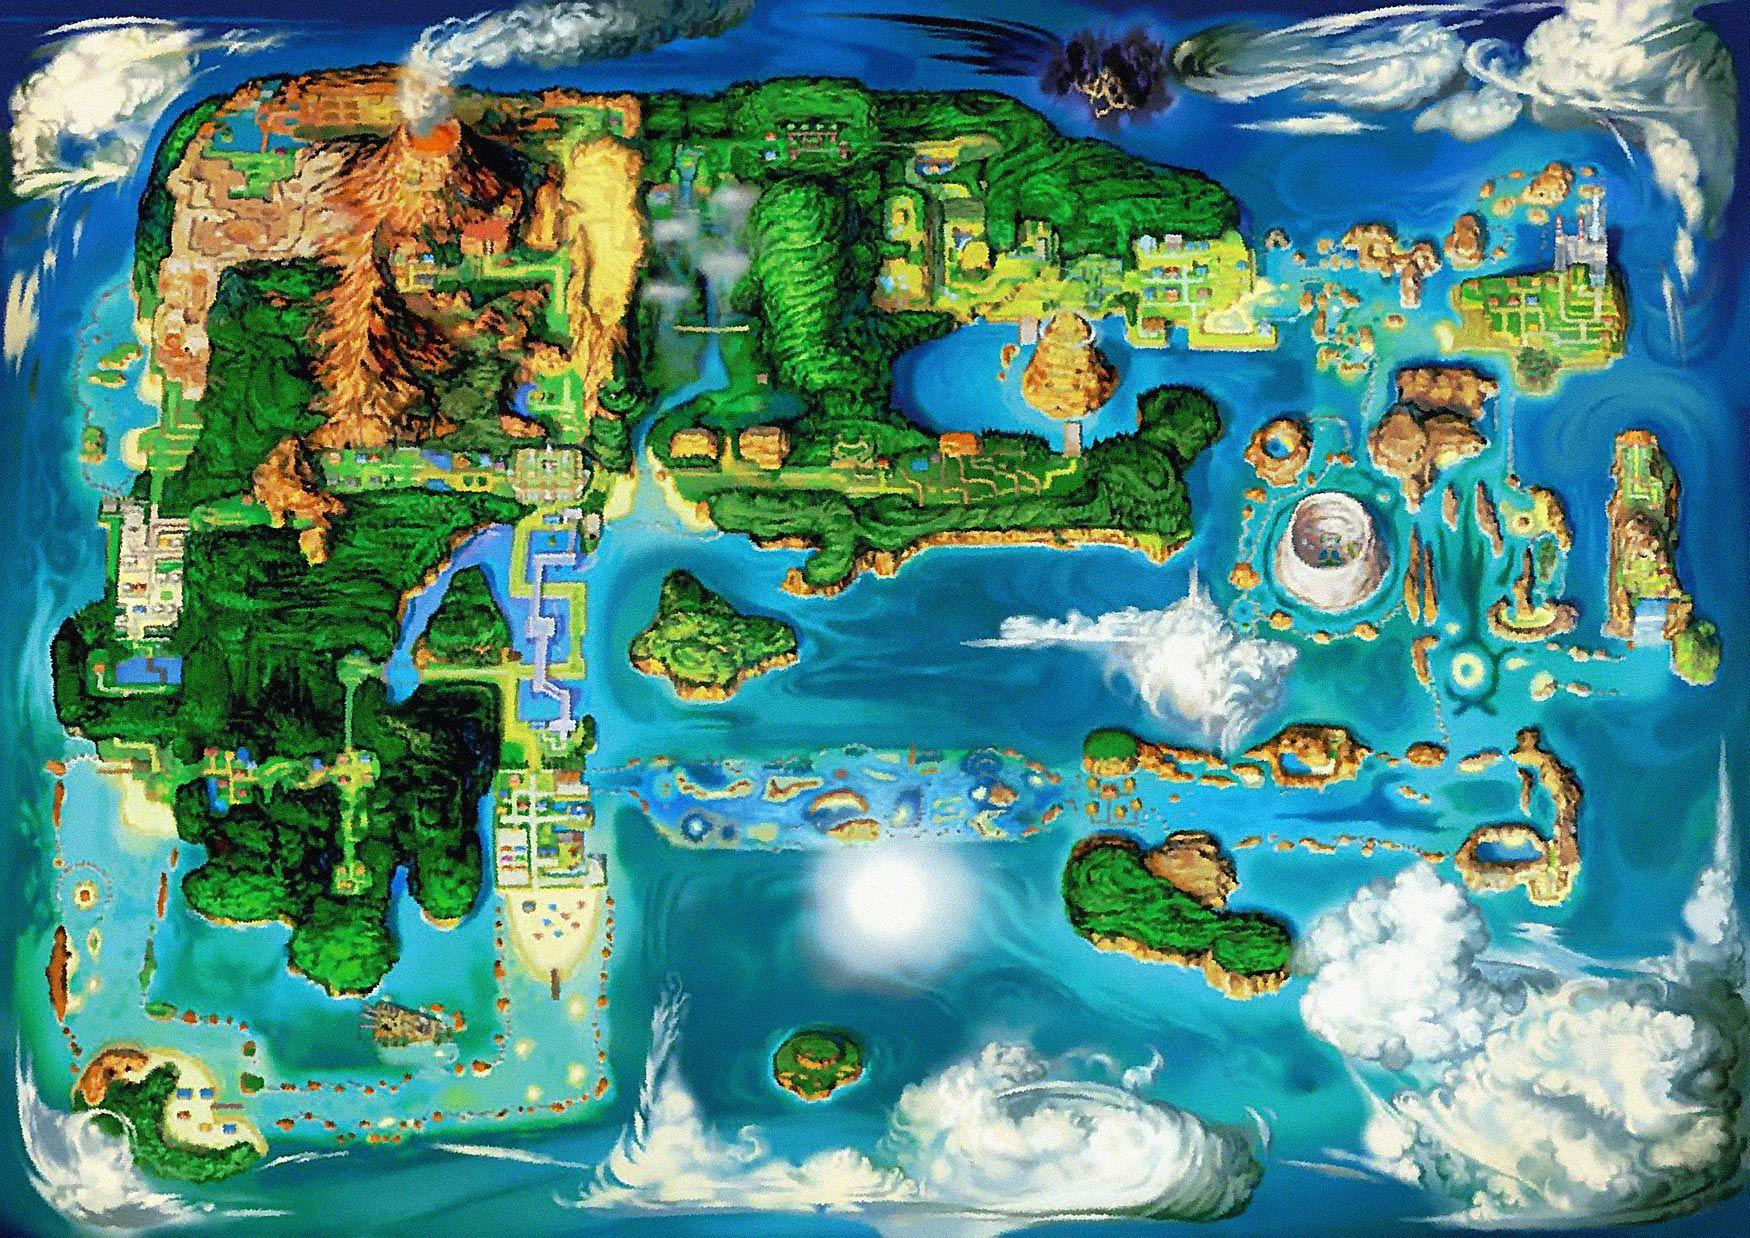 47b947db6f3fb4181375dd03a68f2e5c Pokemon Hoenn World Map on pokemon overworld sprites city, pokemon slateport city, pokemon omega ruby, pokemon trainer battle sprites, pokemon sapphire,